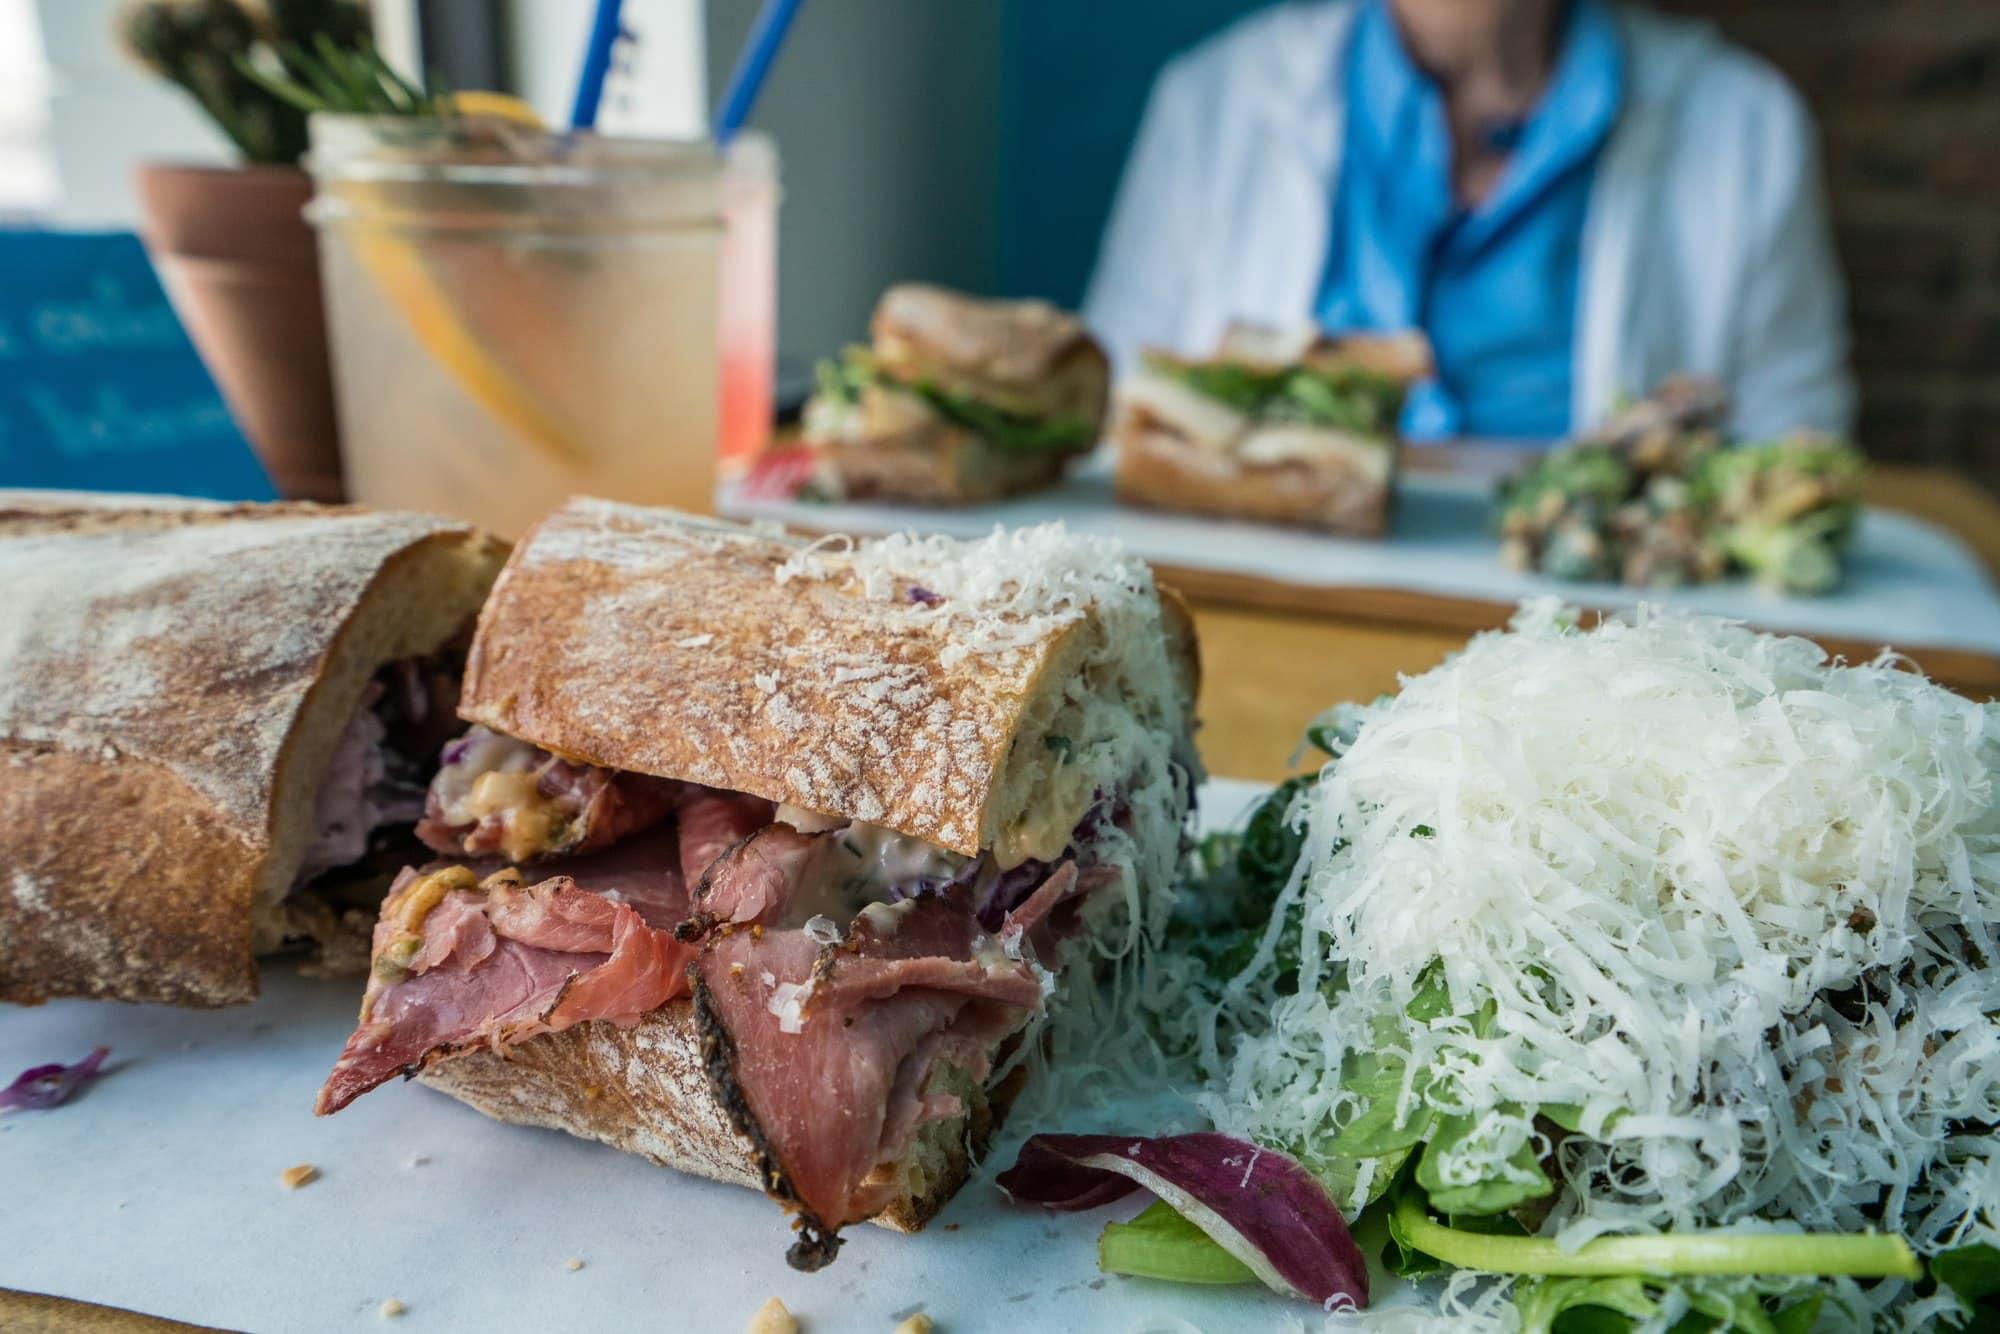 Bleubird Sandwich shop in boise